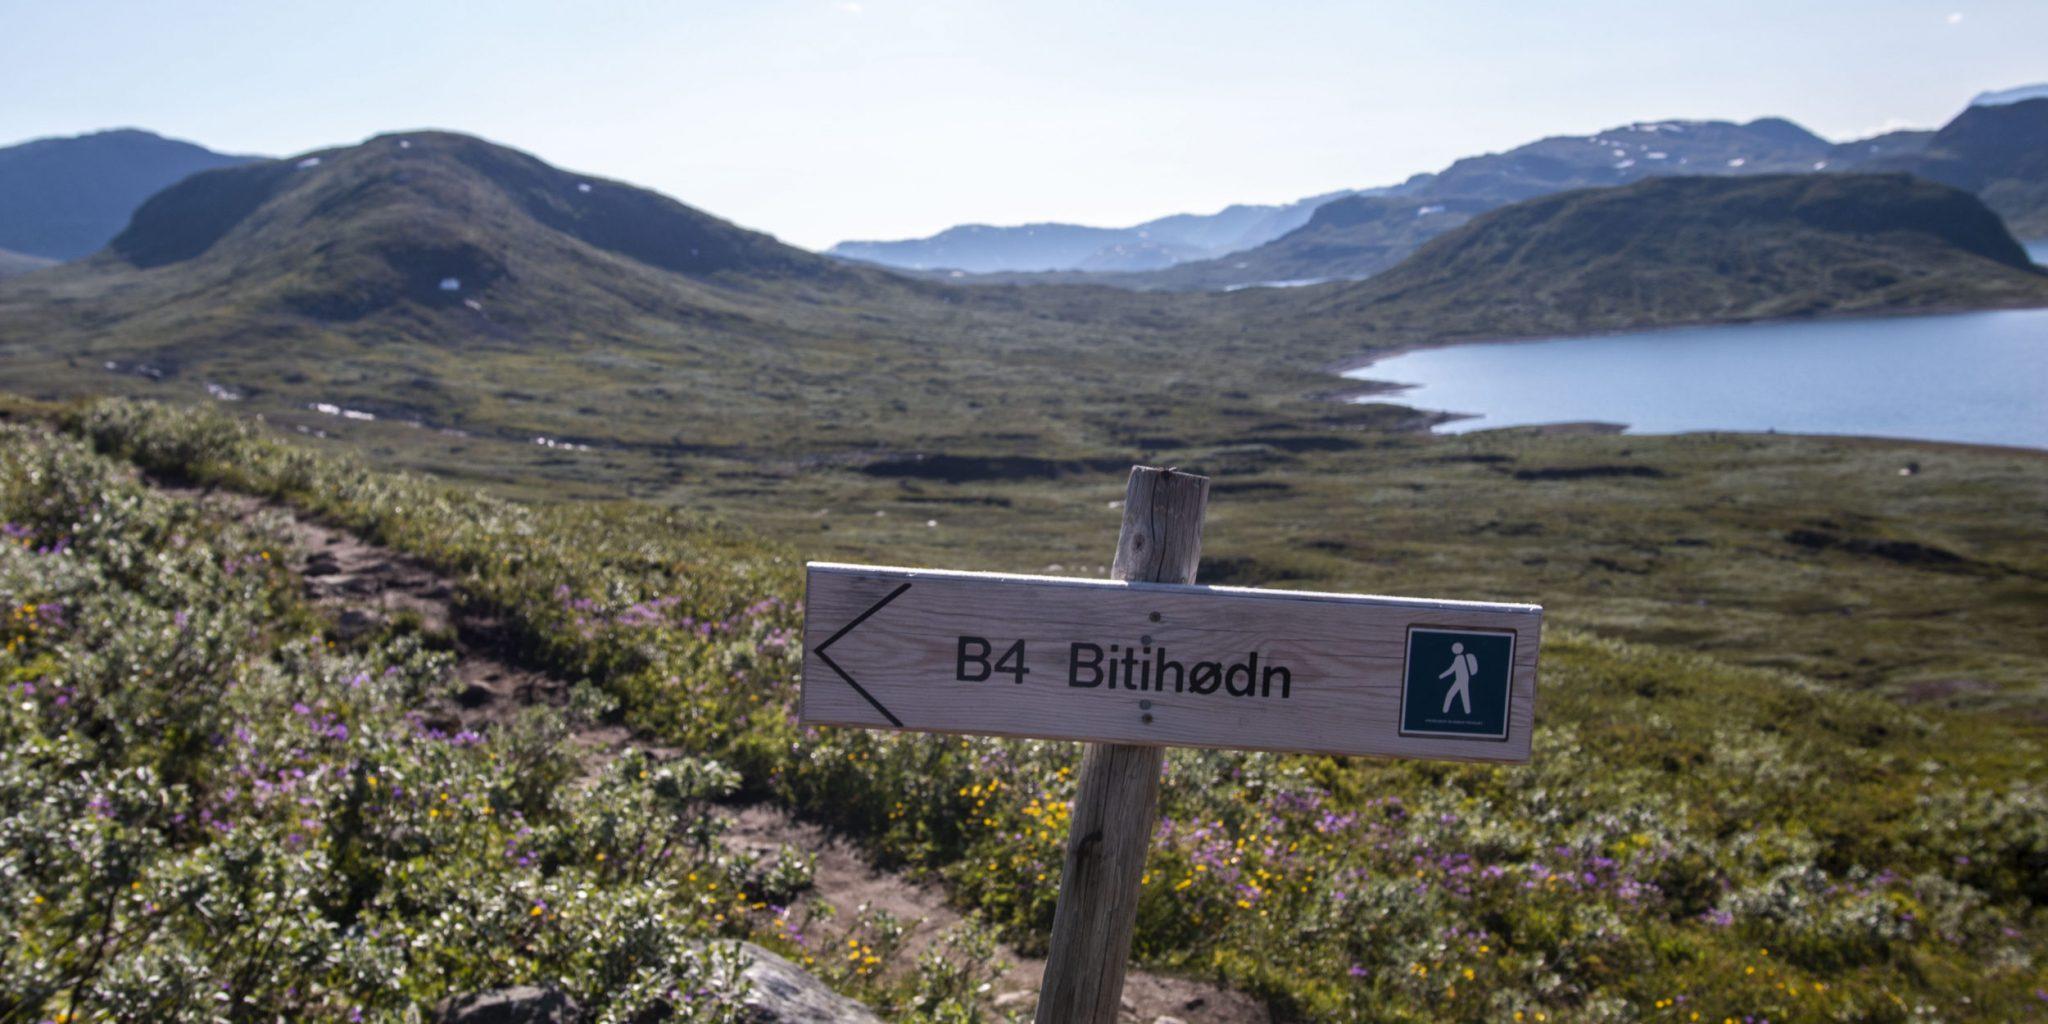 Bitihorn